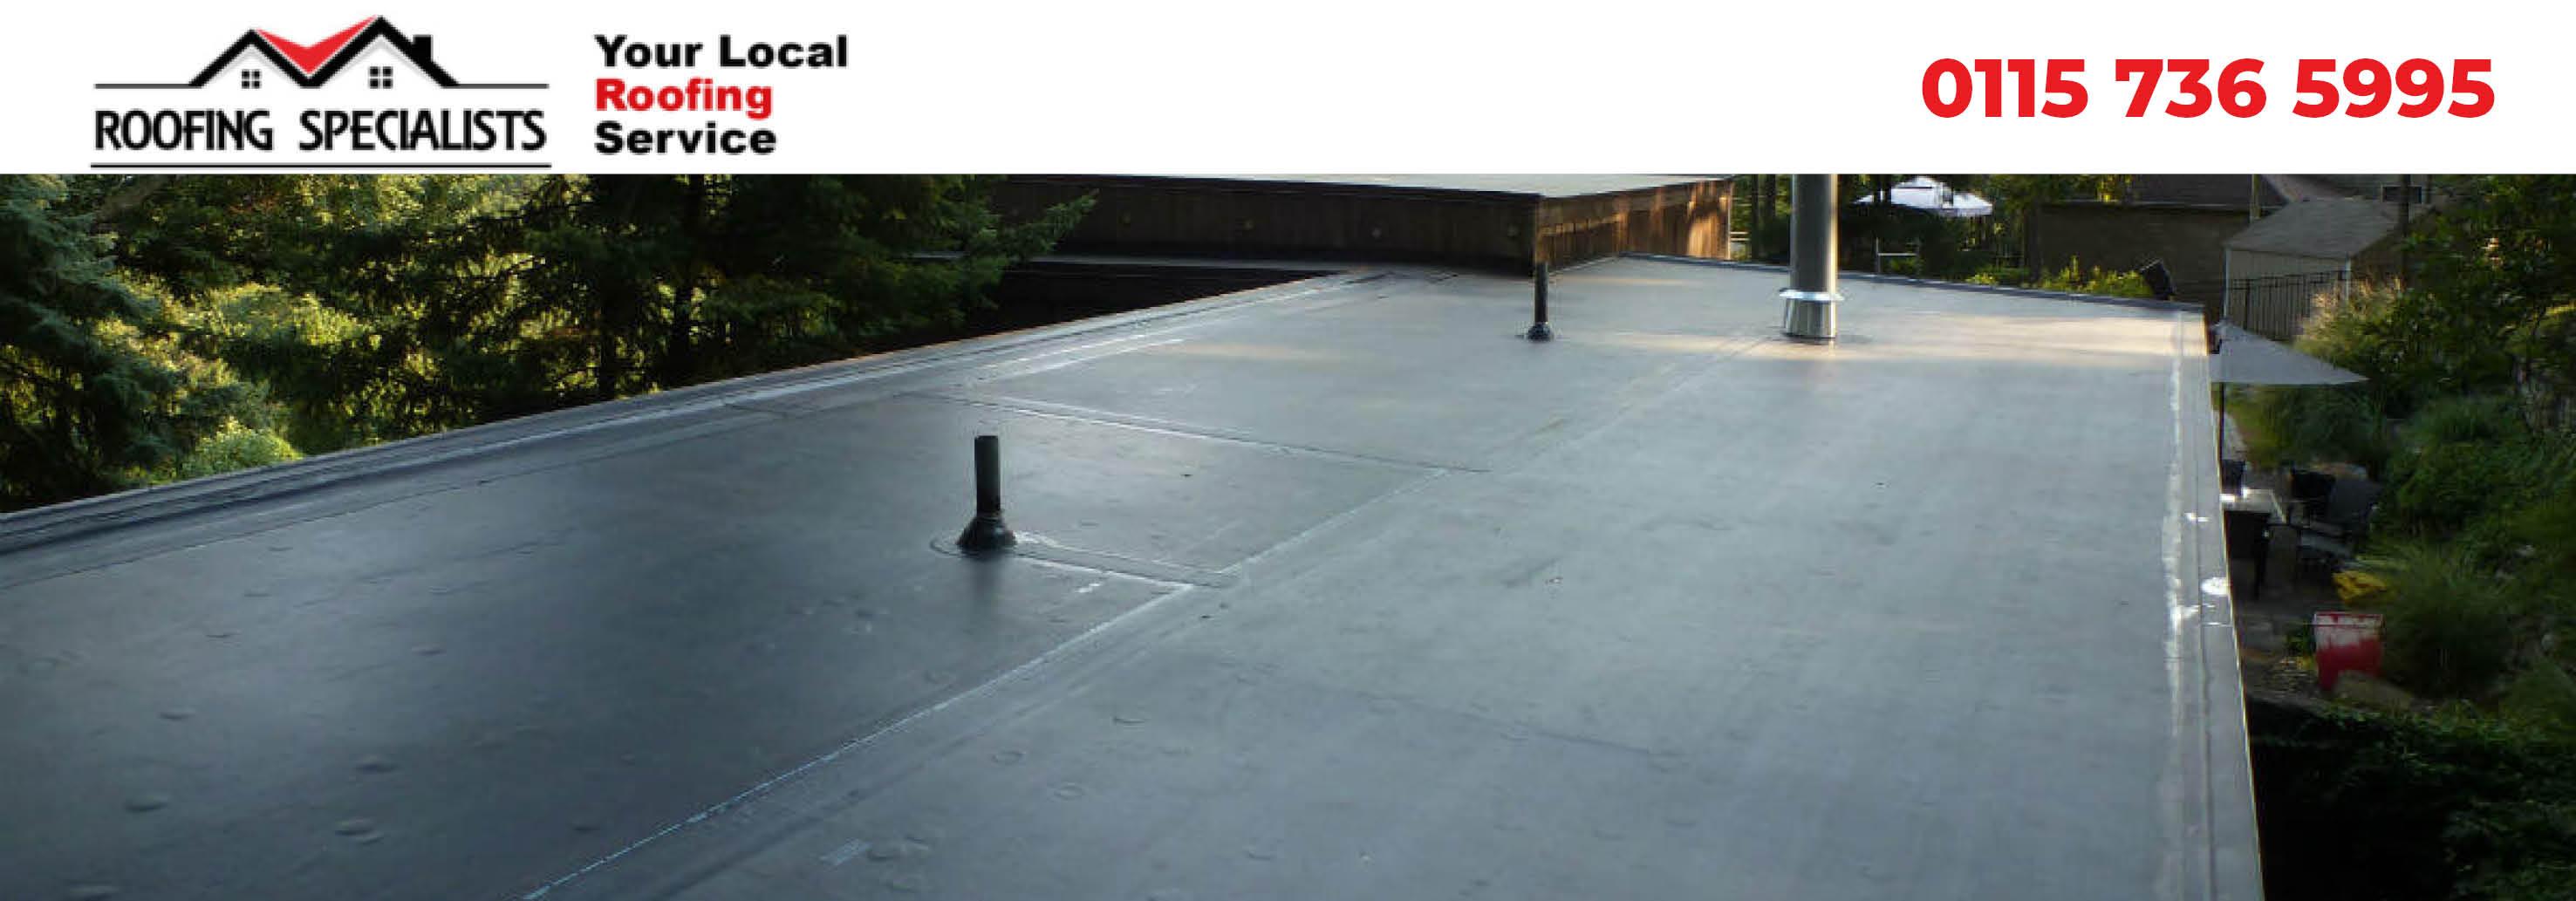 nottingham flat roofing experts header image